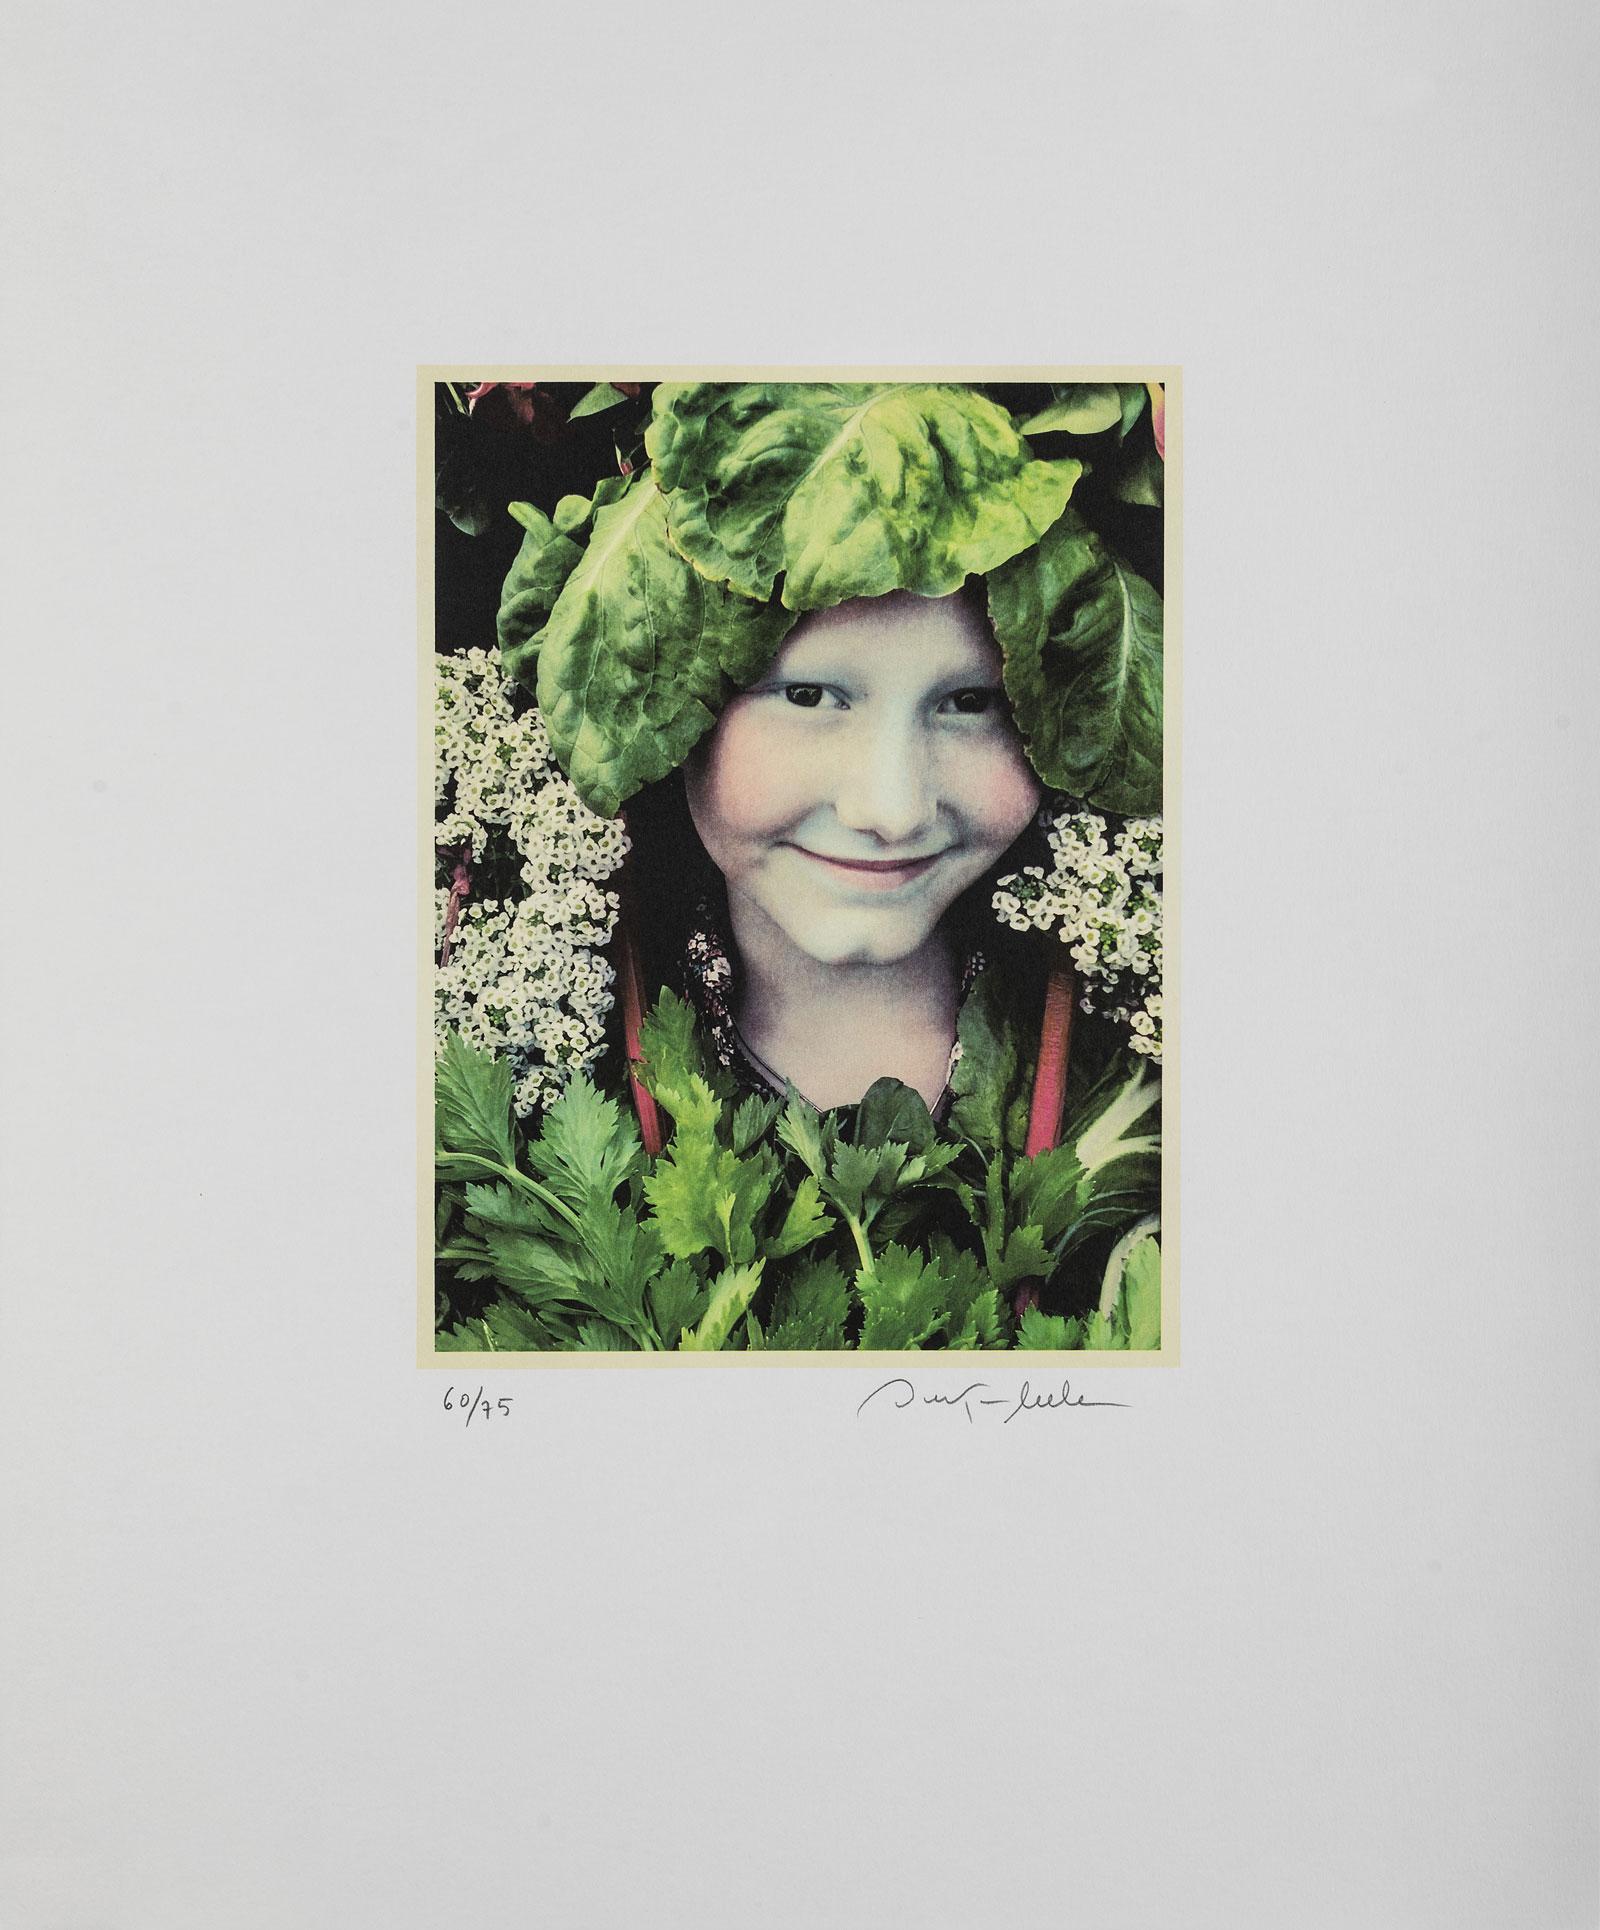 Ouka Leele. Fotolitografías - Exposición Fuendetodos